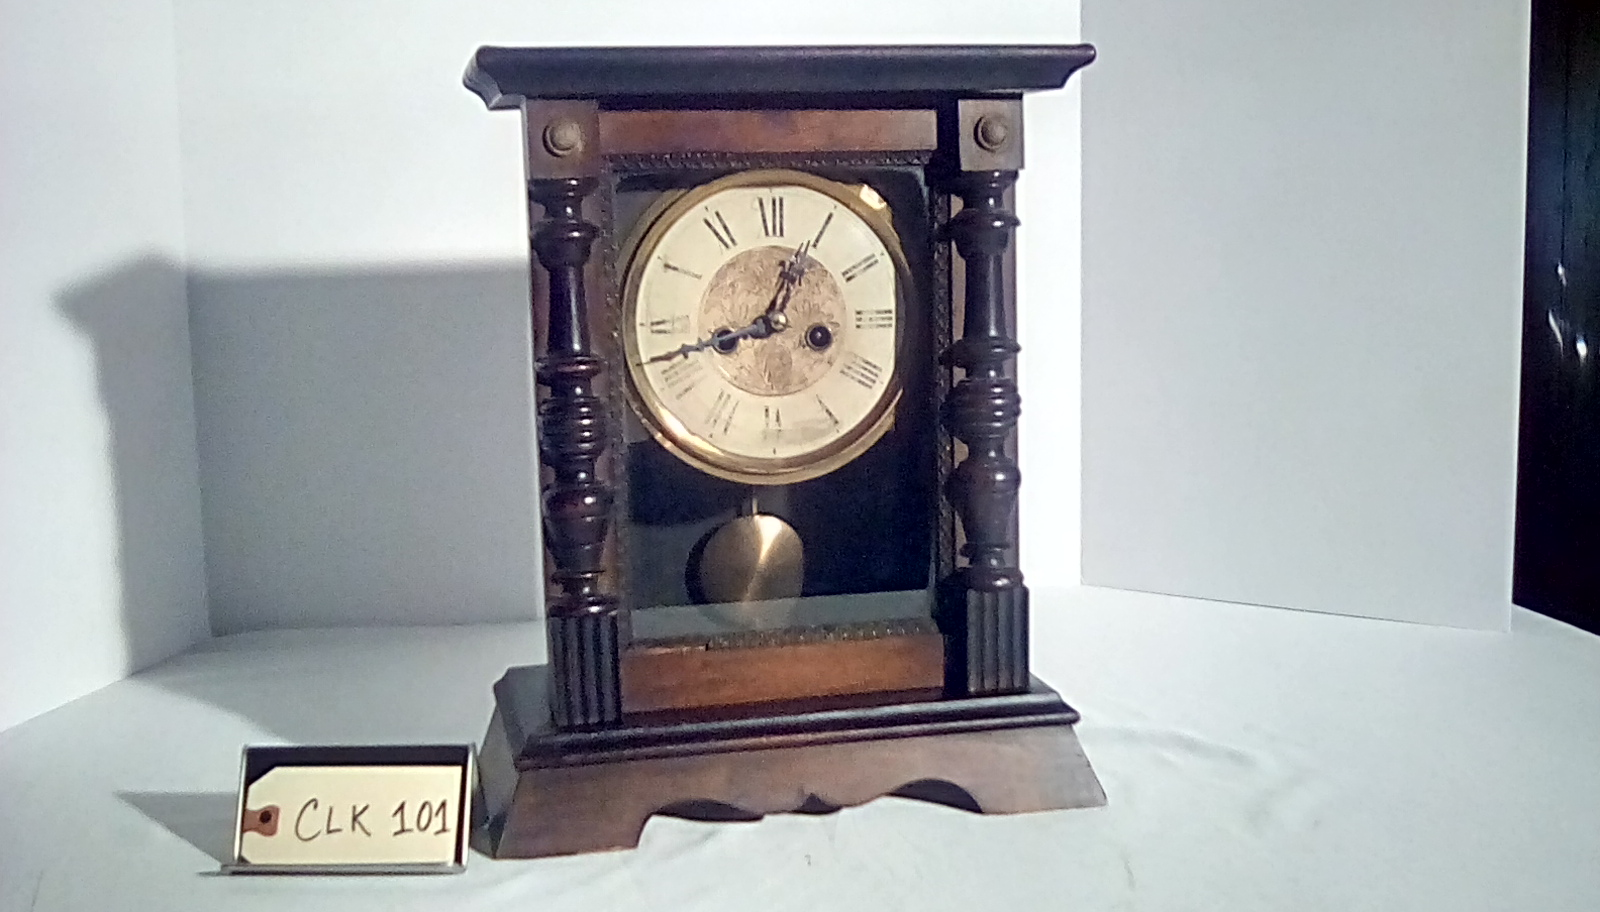 CLK101 wooden mantel clock w/pendulum